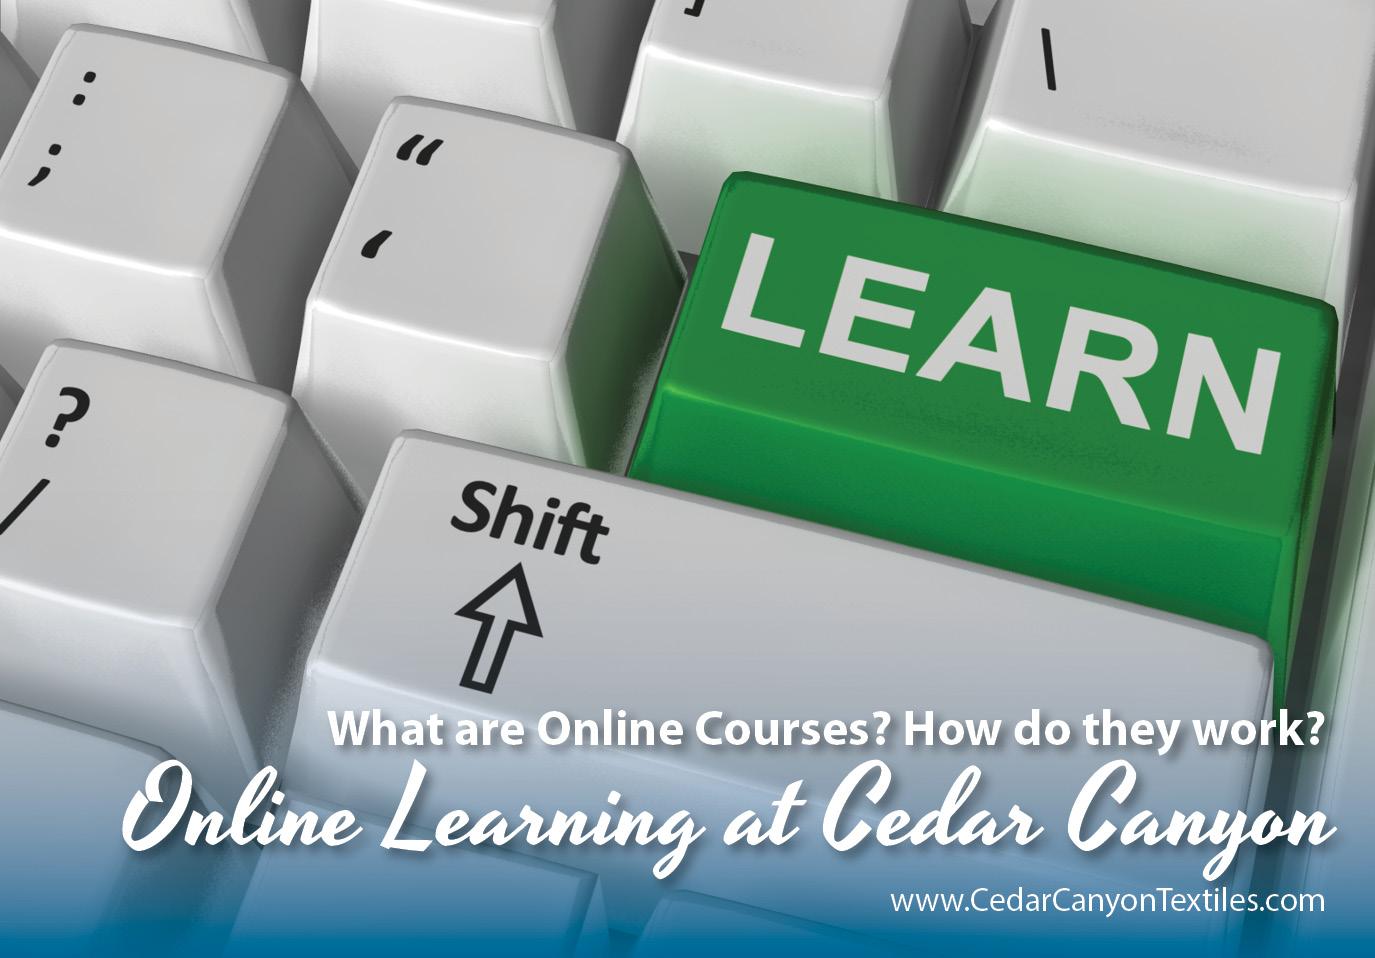 Online-Courses-at-Cedar-Canyon-FB